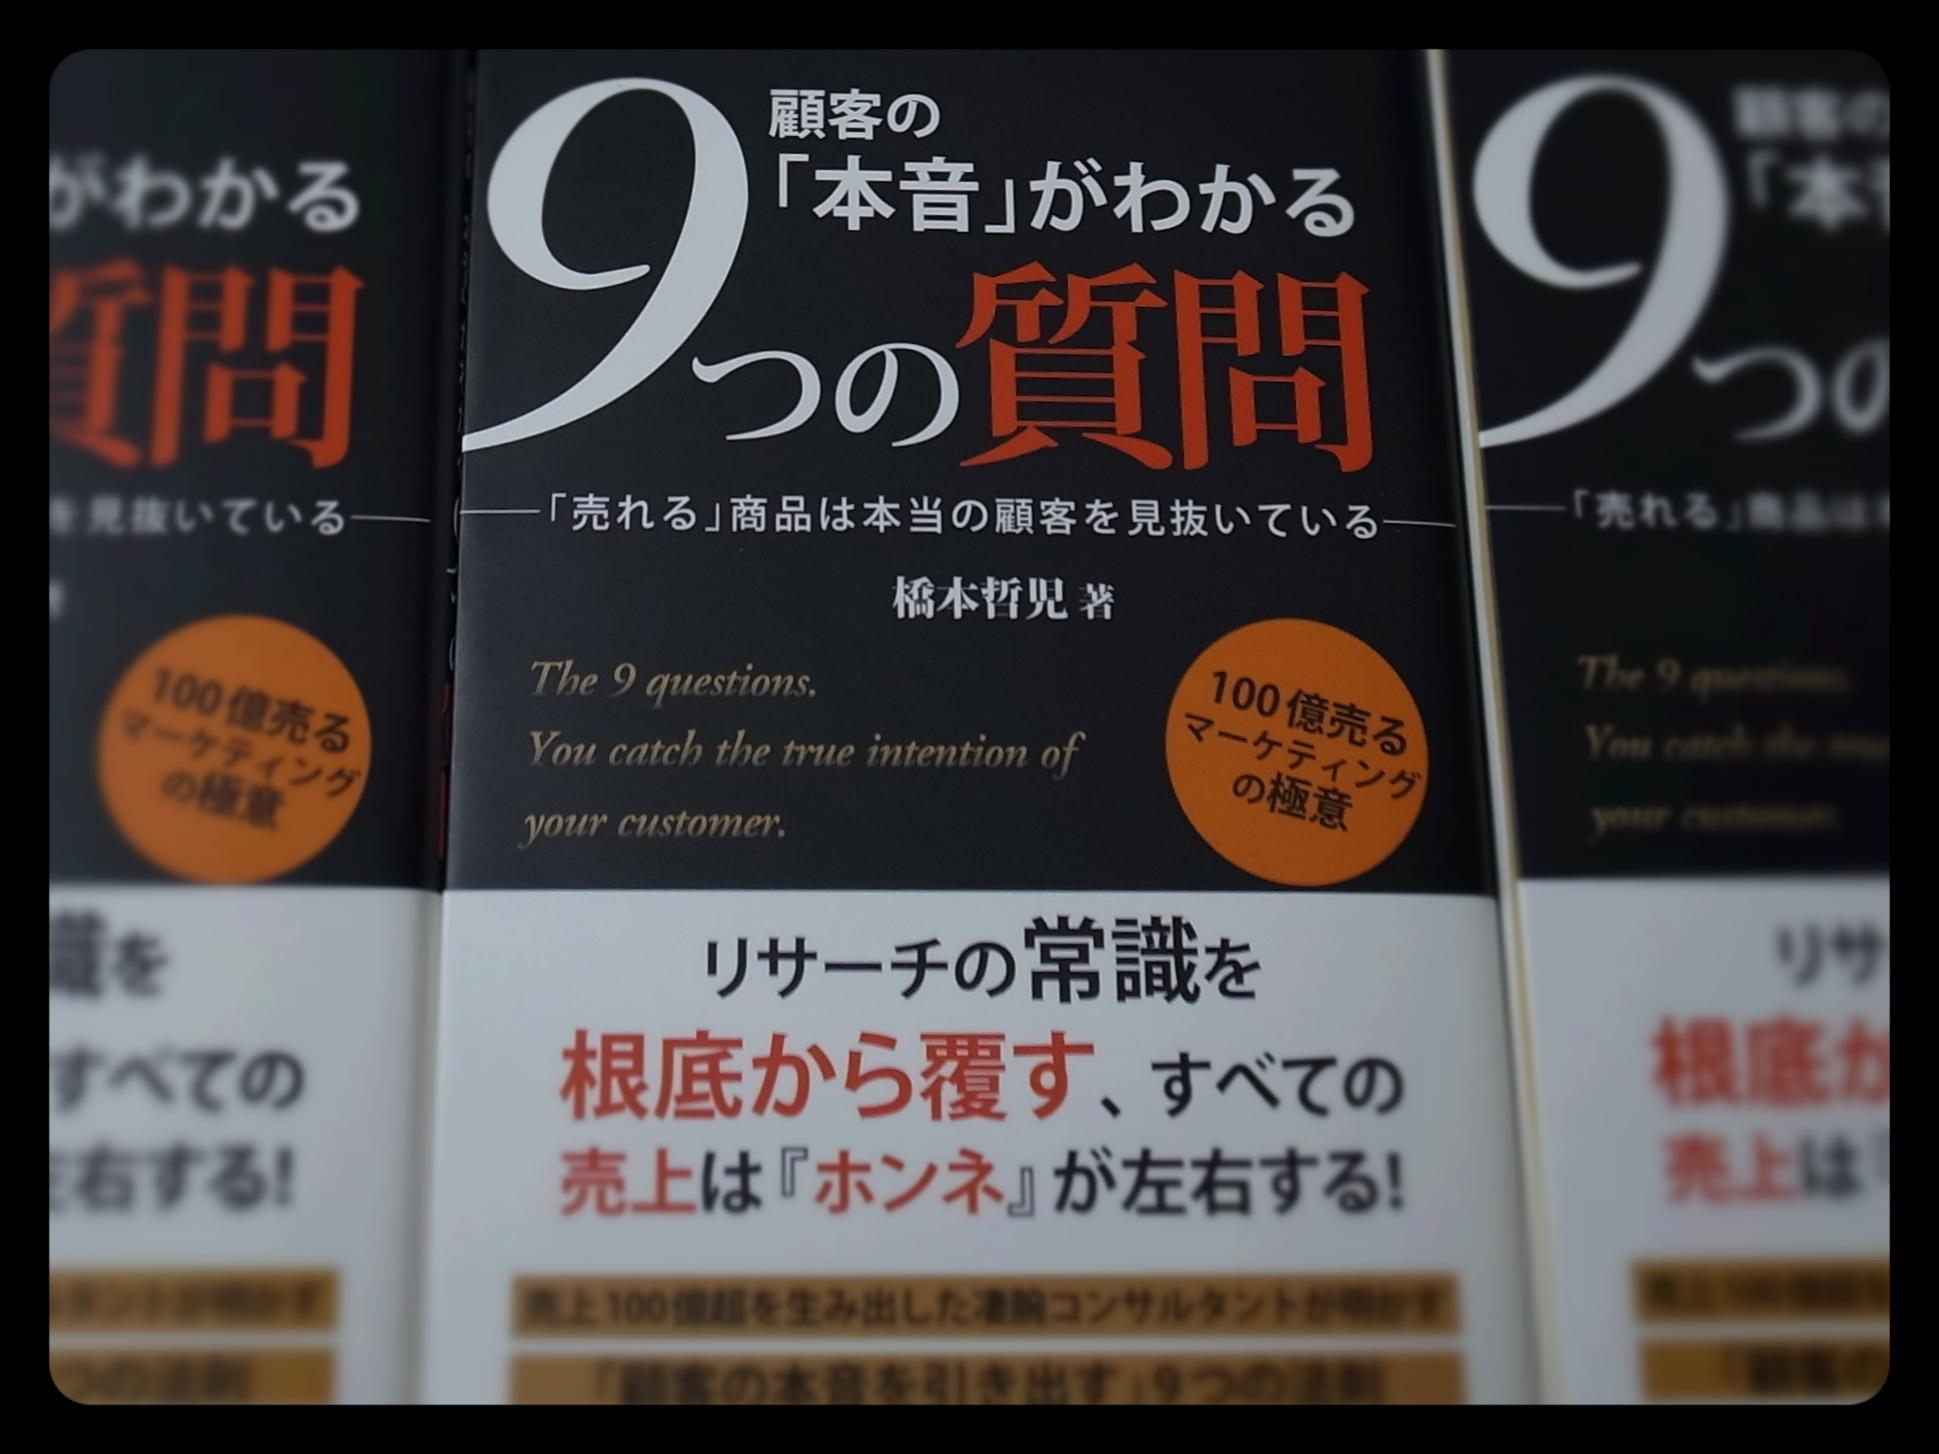 9question1216